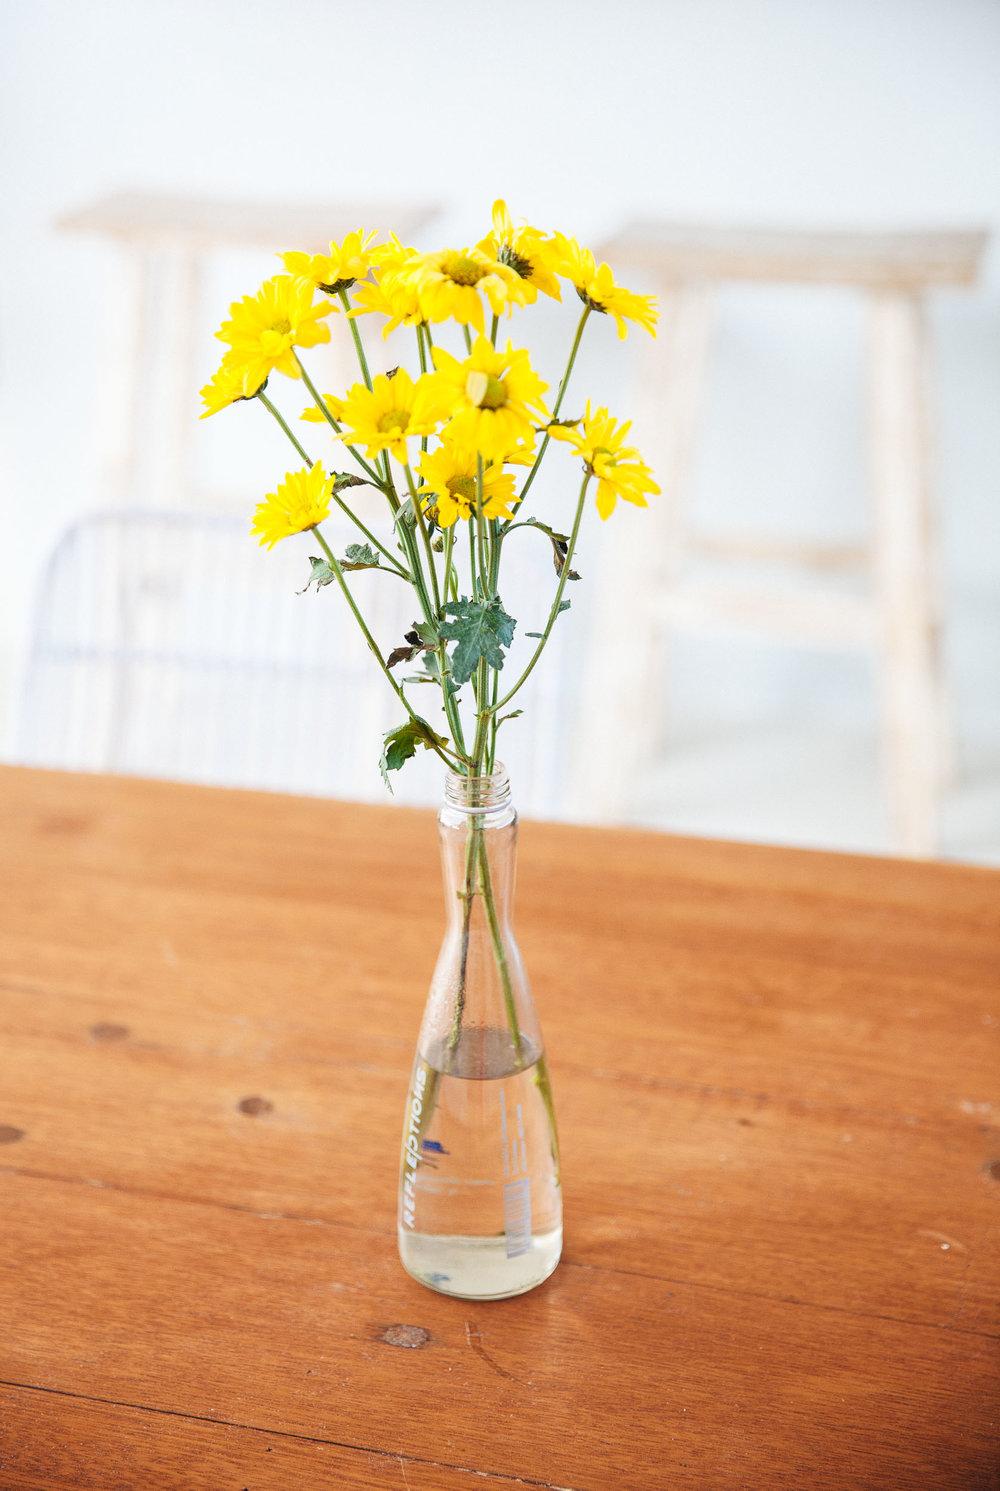 Mubakan-4-flower.jpg